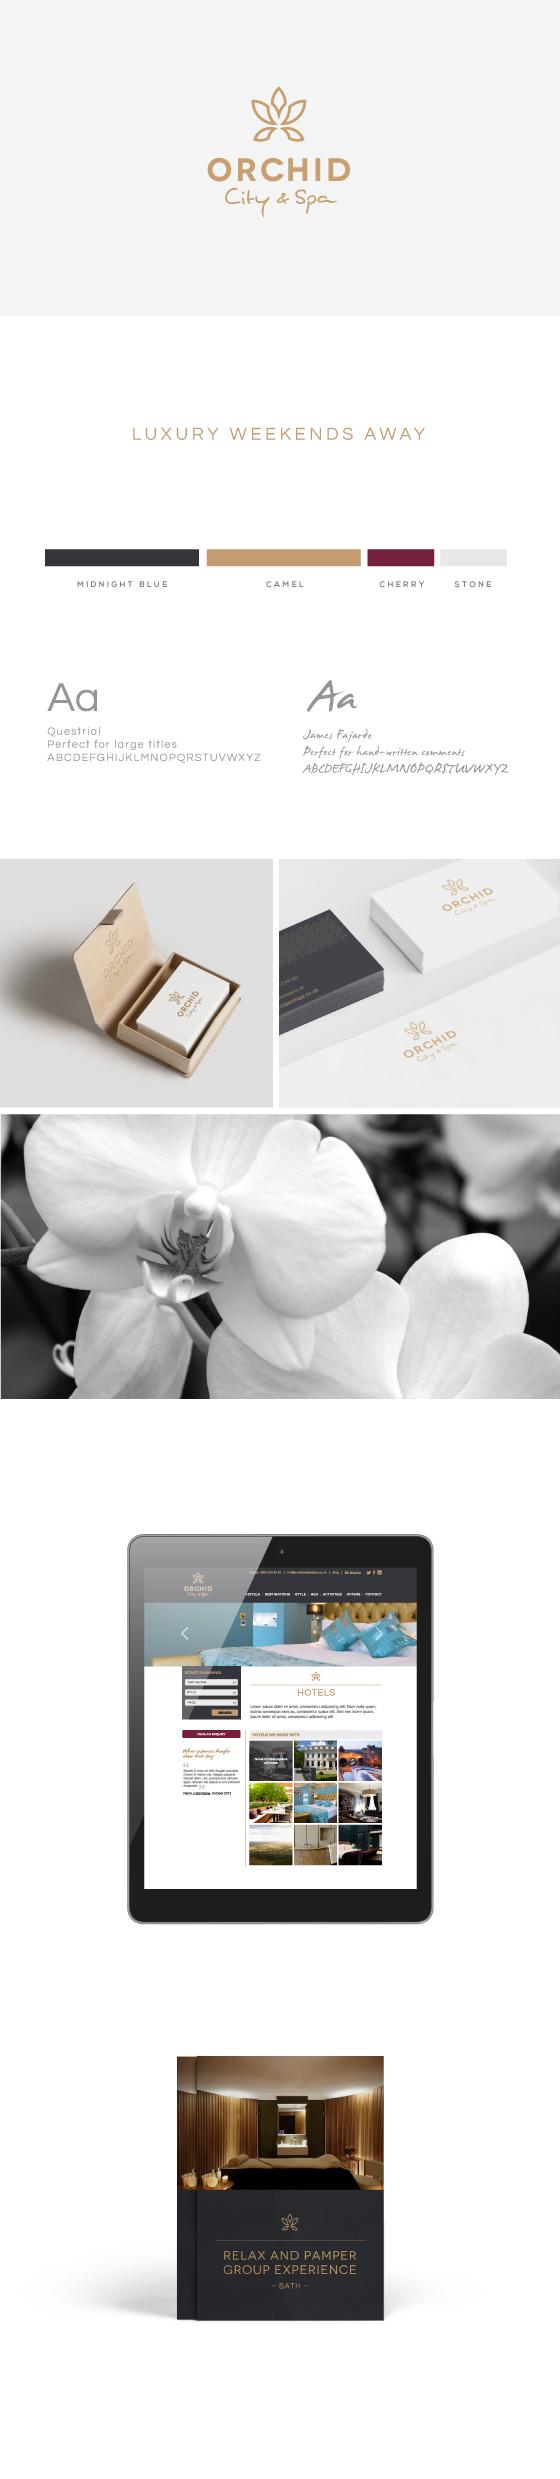 Brand design for orchid city & spa bristol